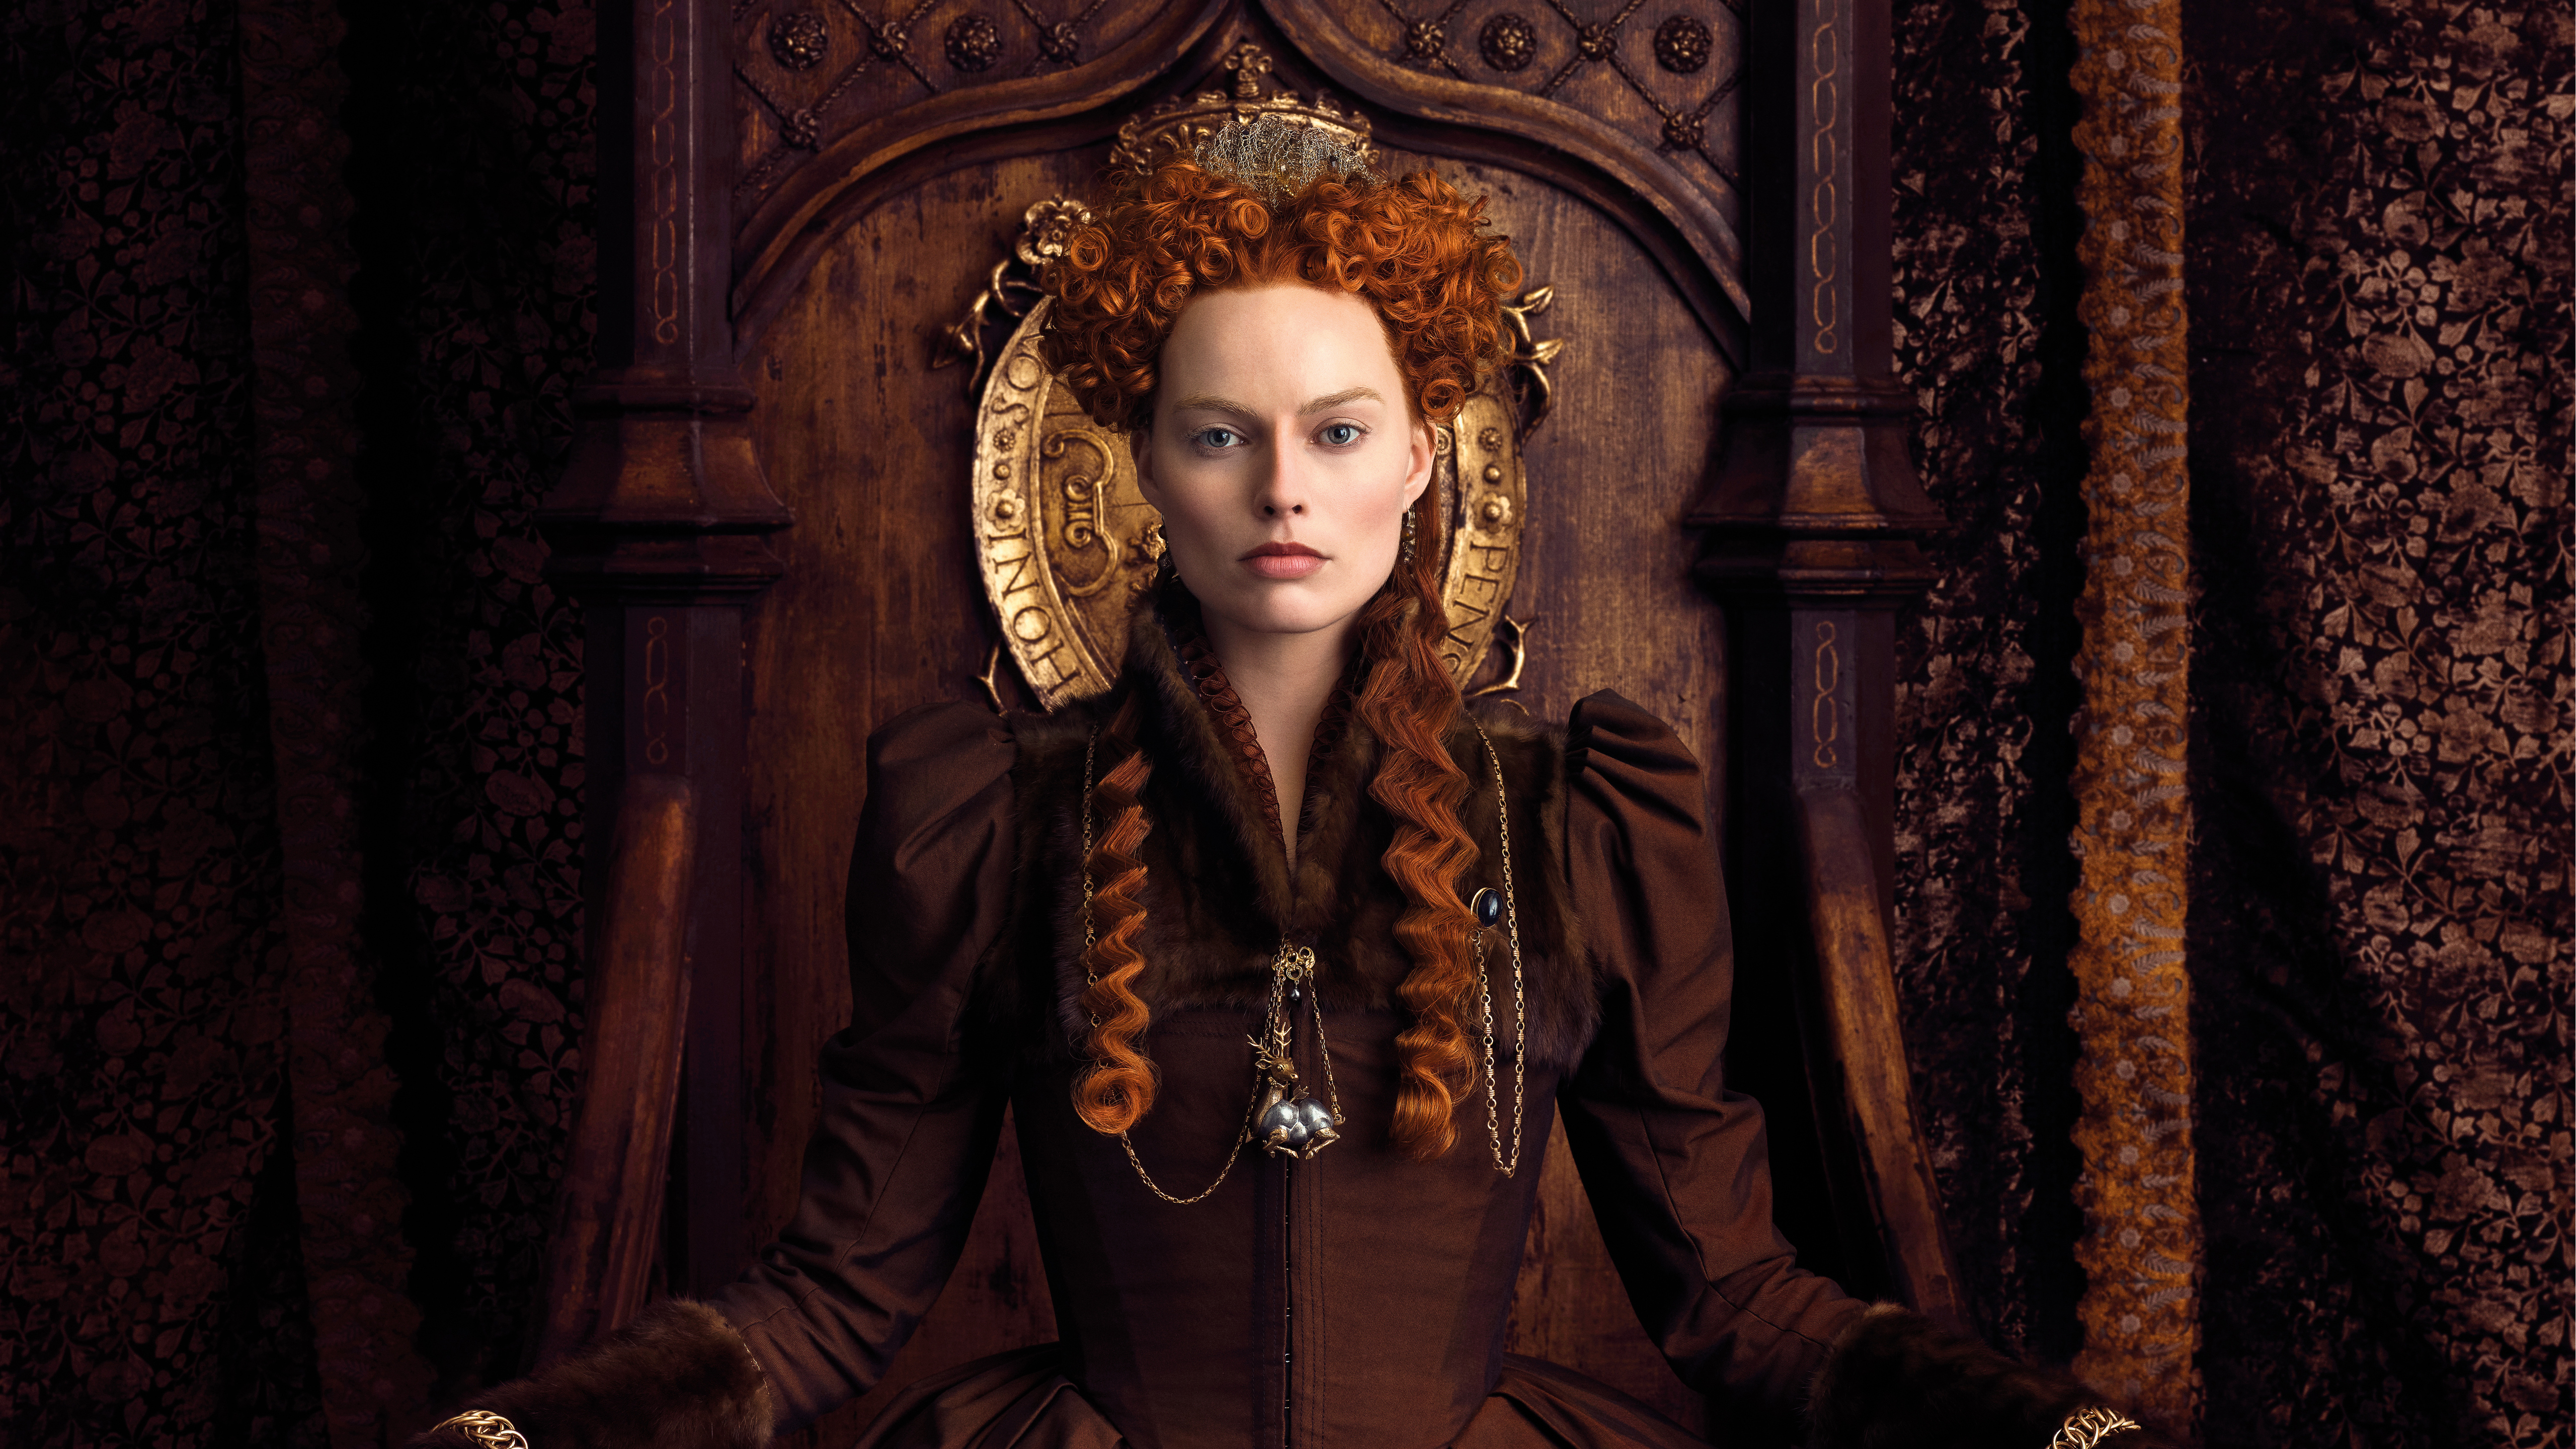 margot-robbie-as-elizabeth-in-mary-queen-of-scots-movie-5k-s3.jpg